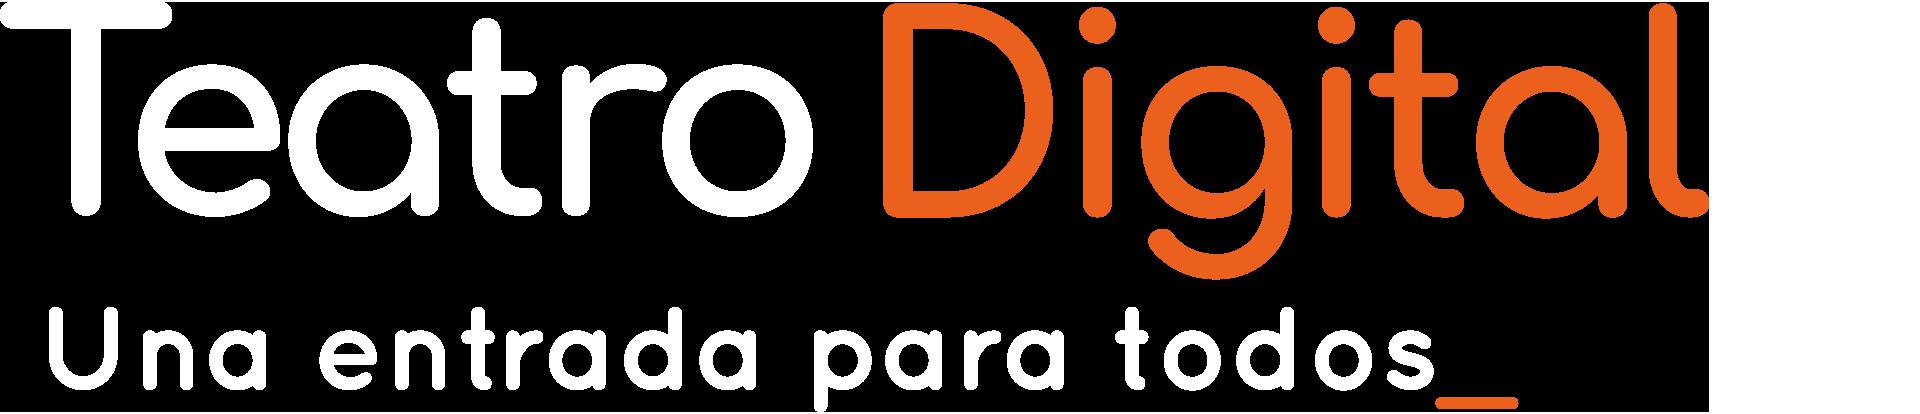 Teatro Digital